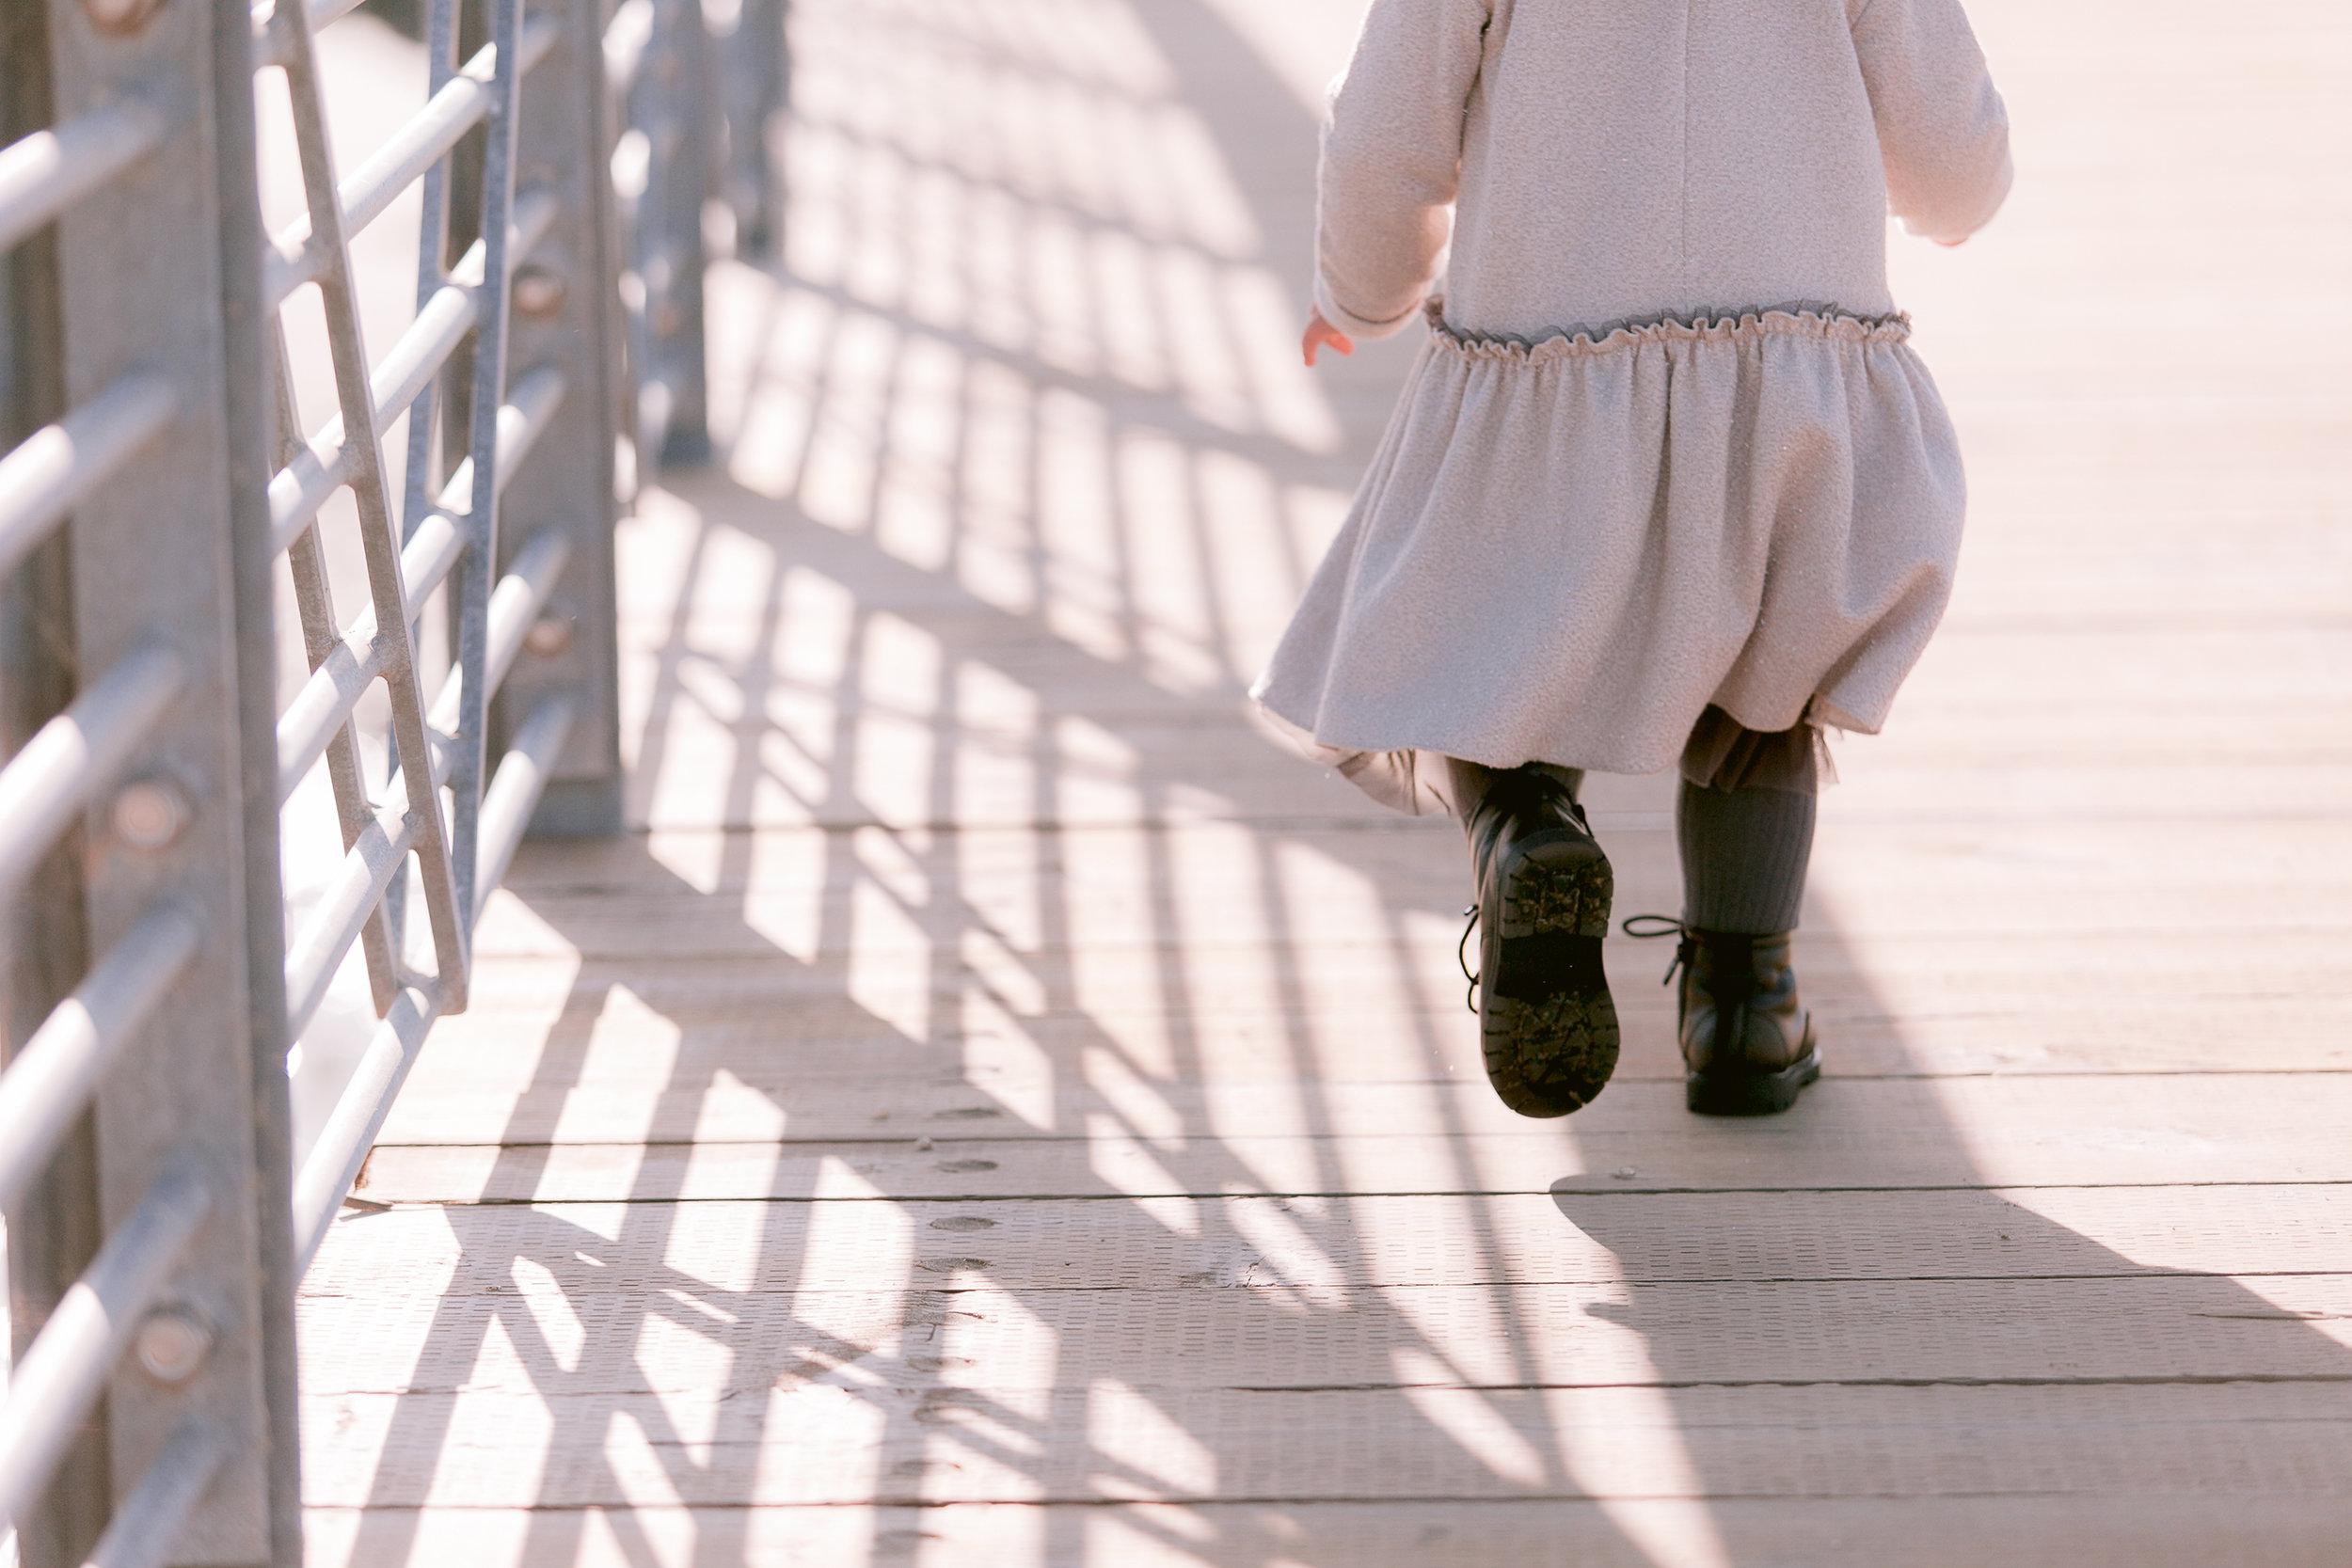 San_Francisco_Children_and_Family_Portrait_015.jpg